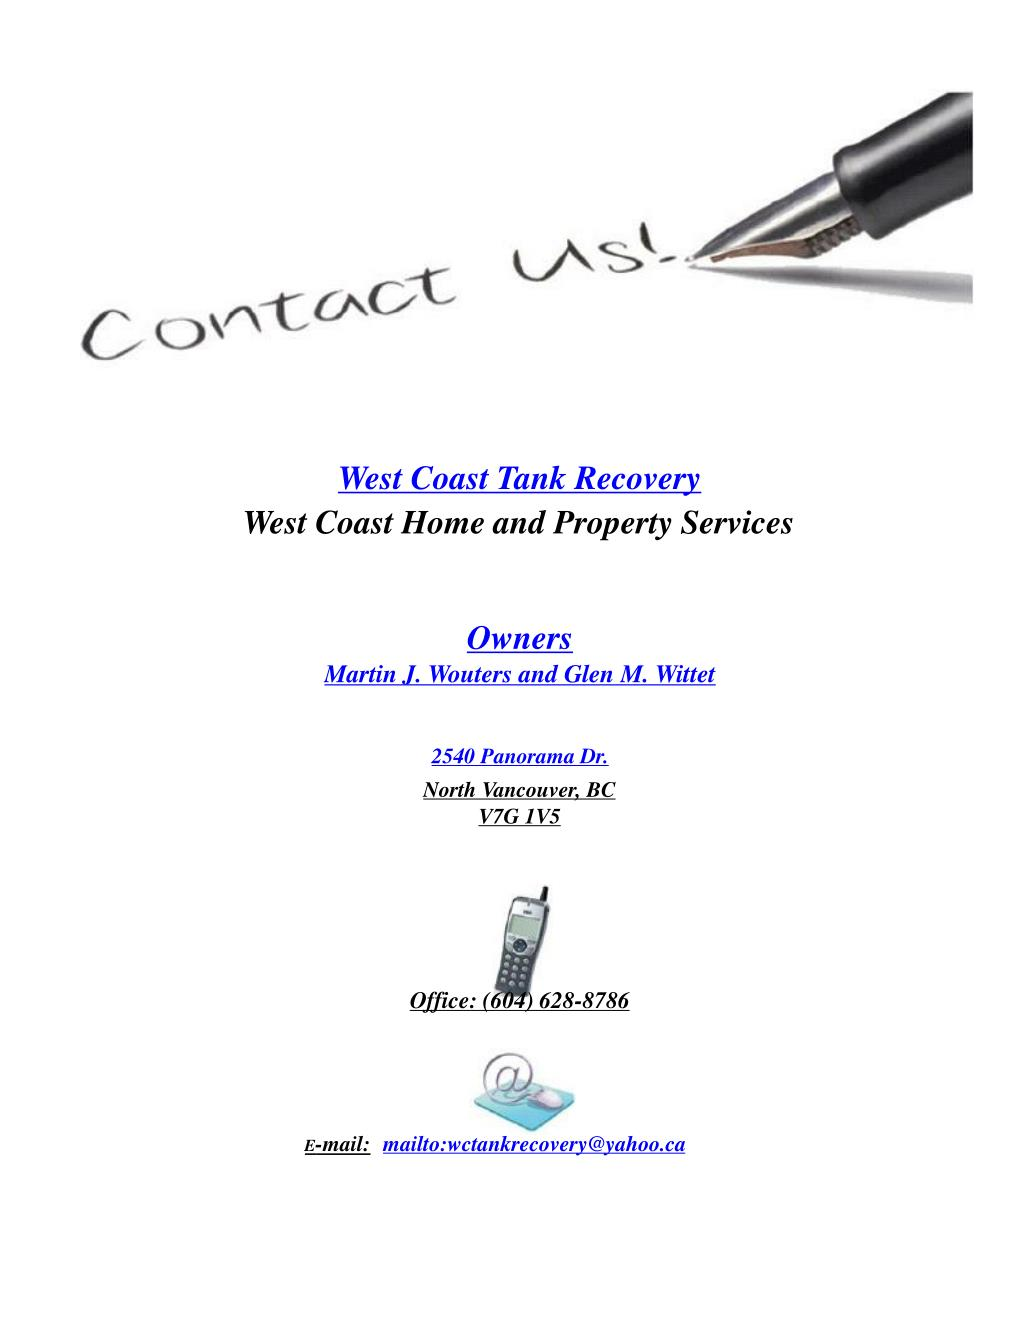 West Coast Tank Recovery